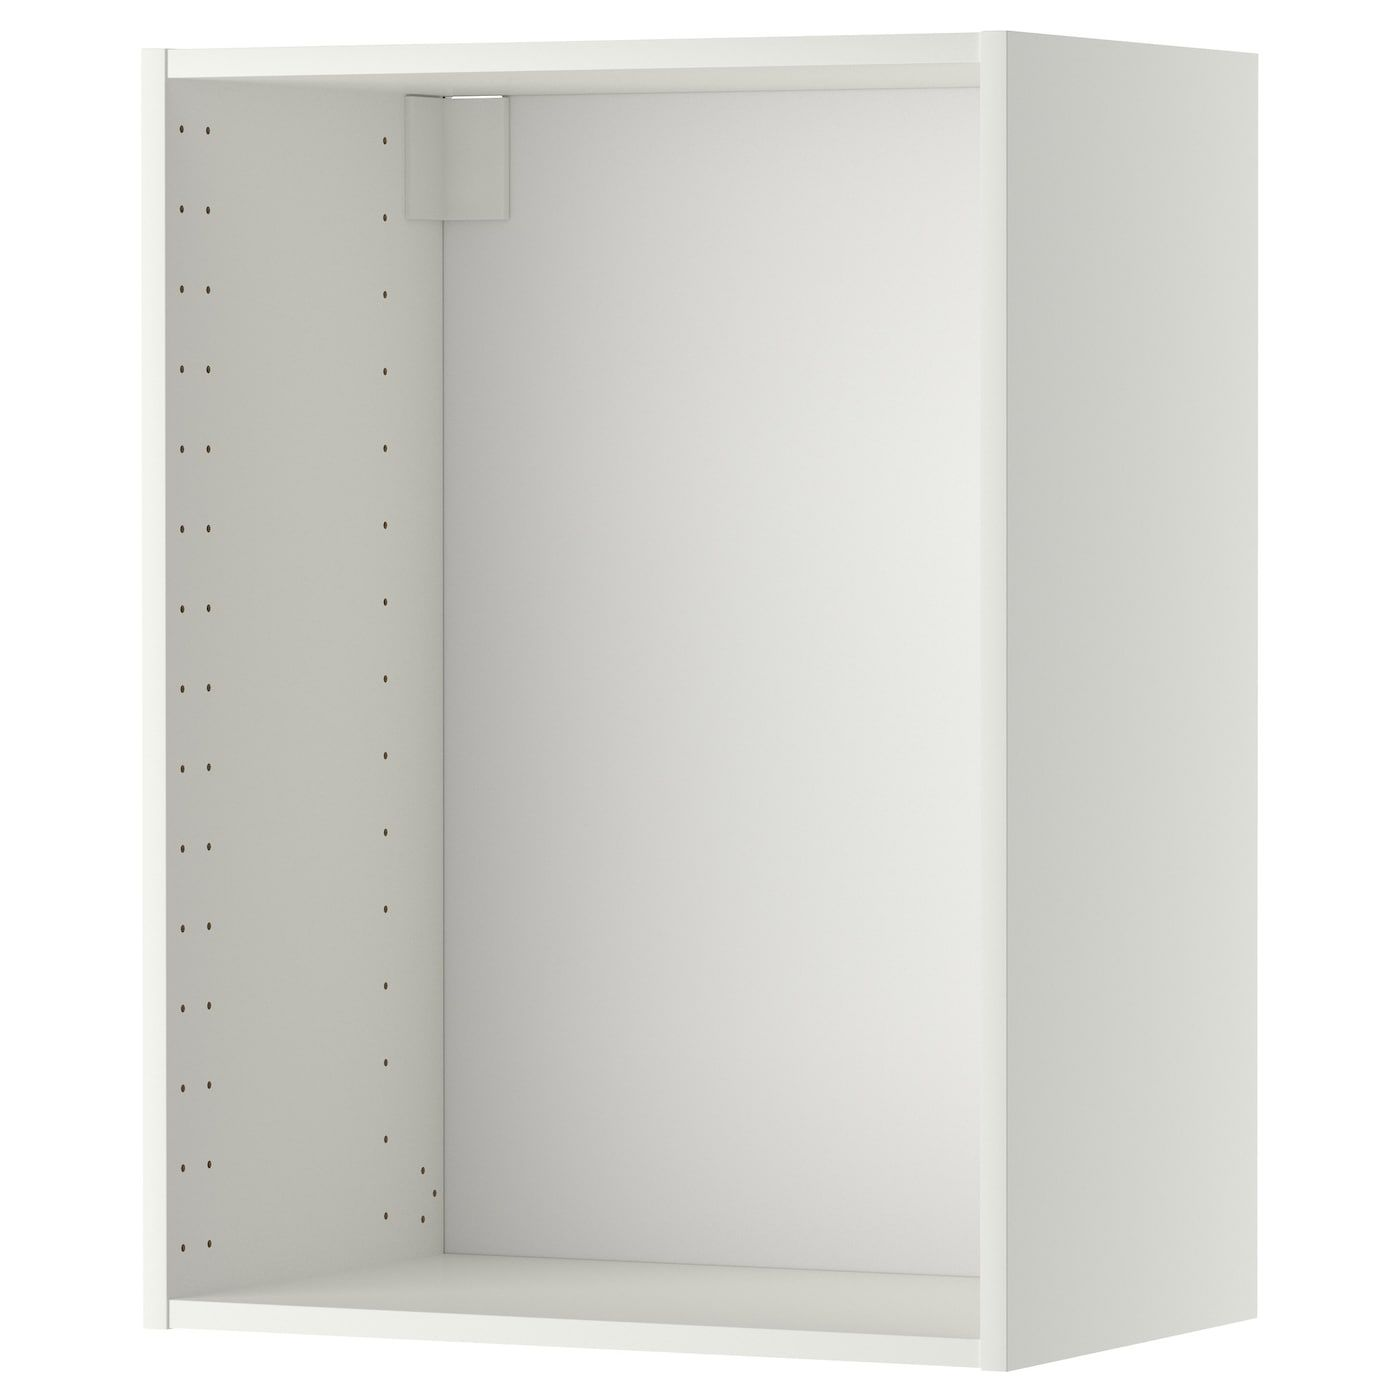 Metod Estructura Armario De Pared Blanco 60x37x80 Cm Ikea In 2020 Ikea Wall Cabinet Ikea Wall Cabinets